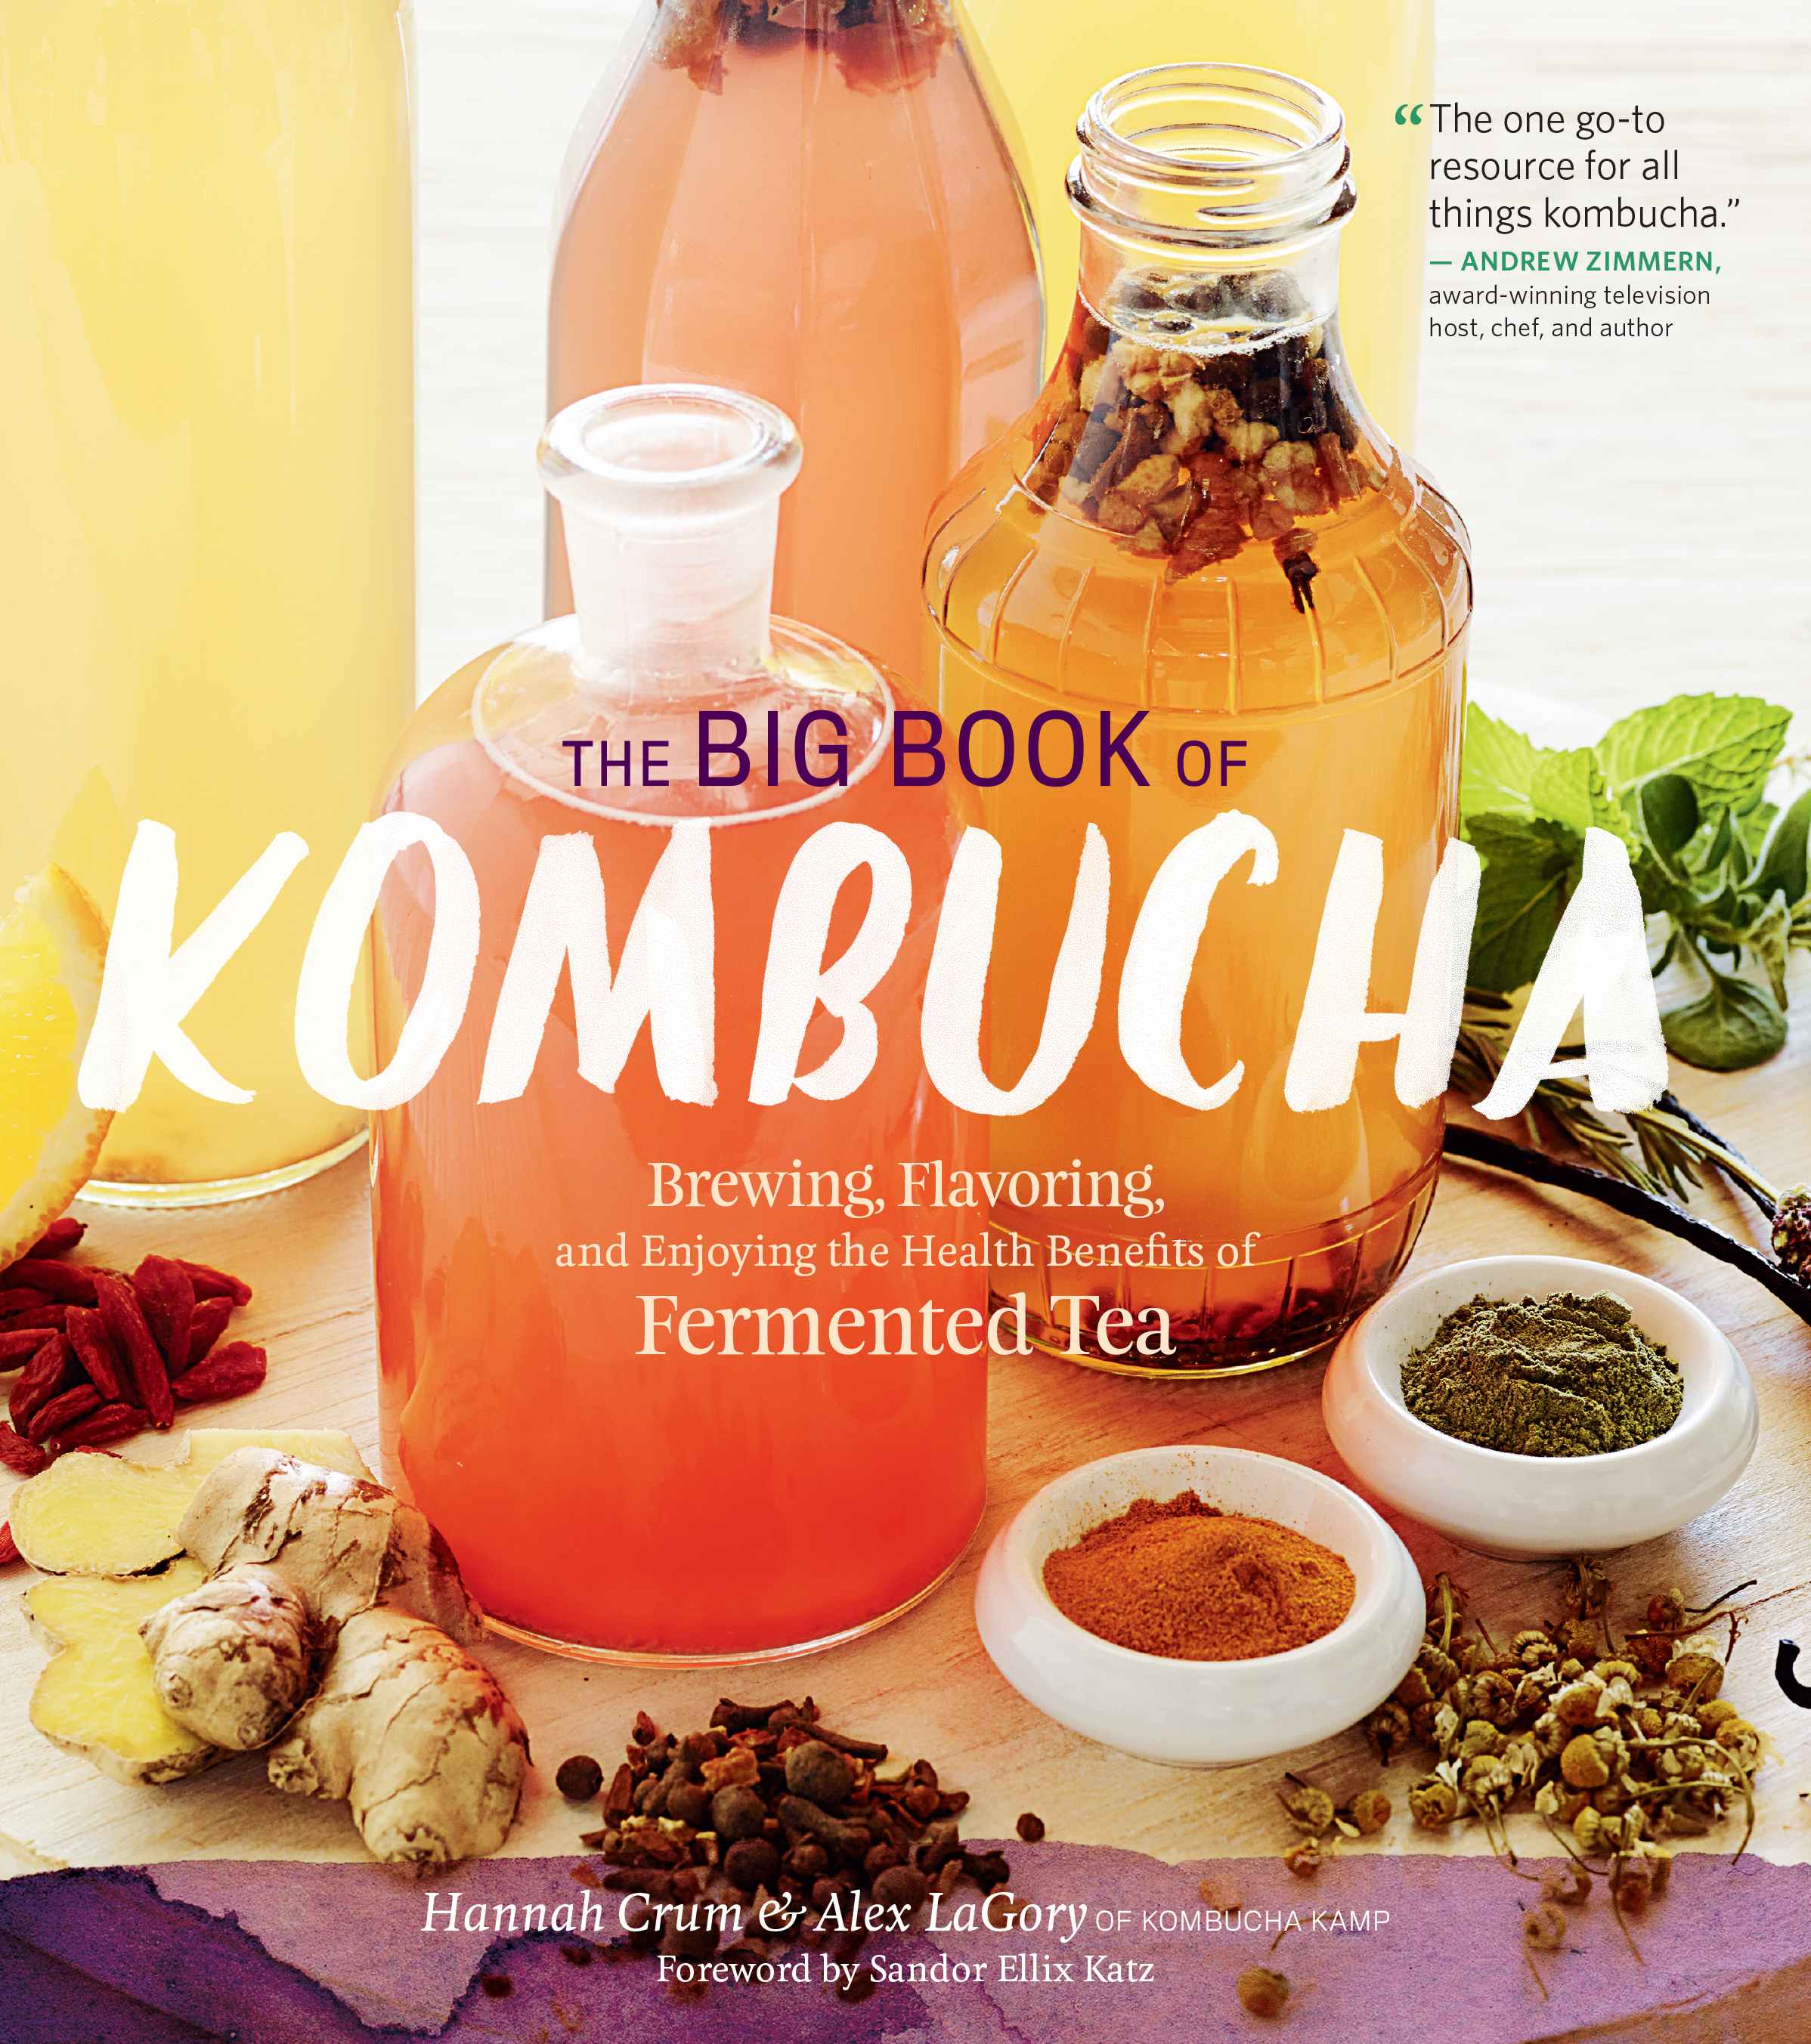 The Big Book of Kombucha Brewing, Flavoring, and Enjoying the Health Benefits of Fermented Tea - Hannah Crum